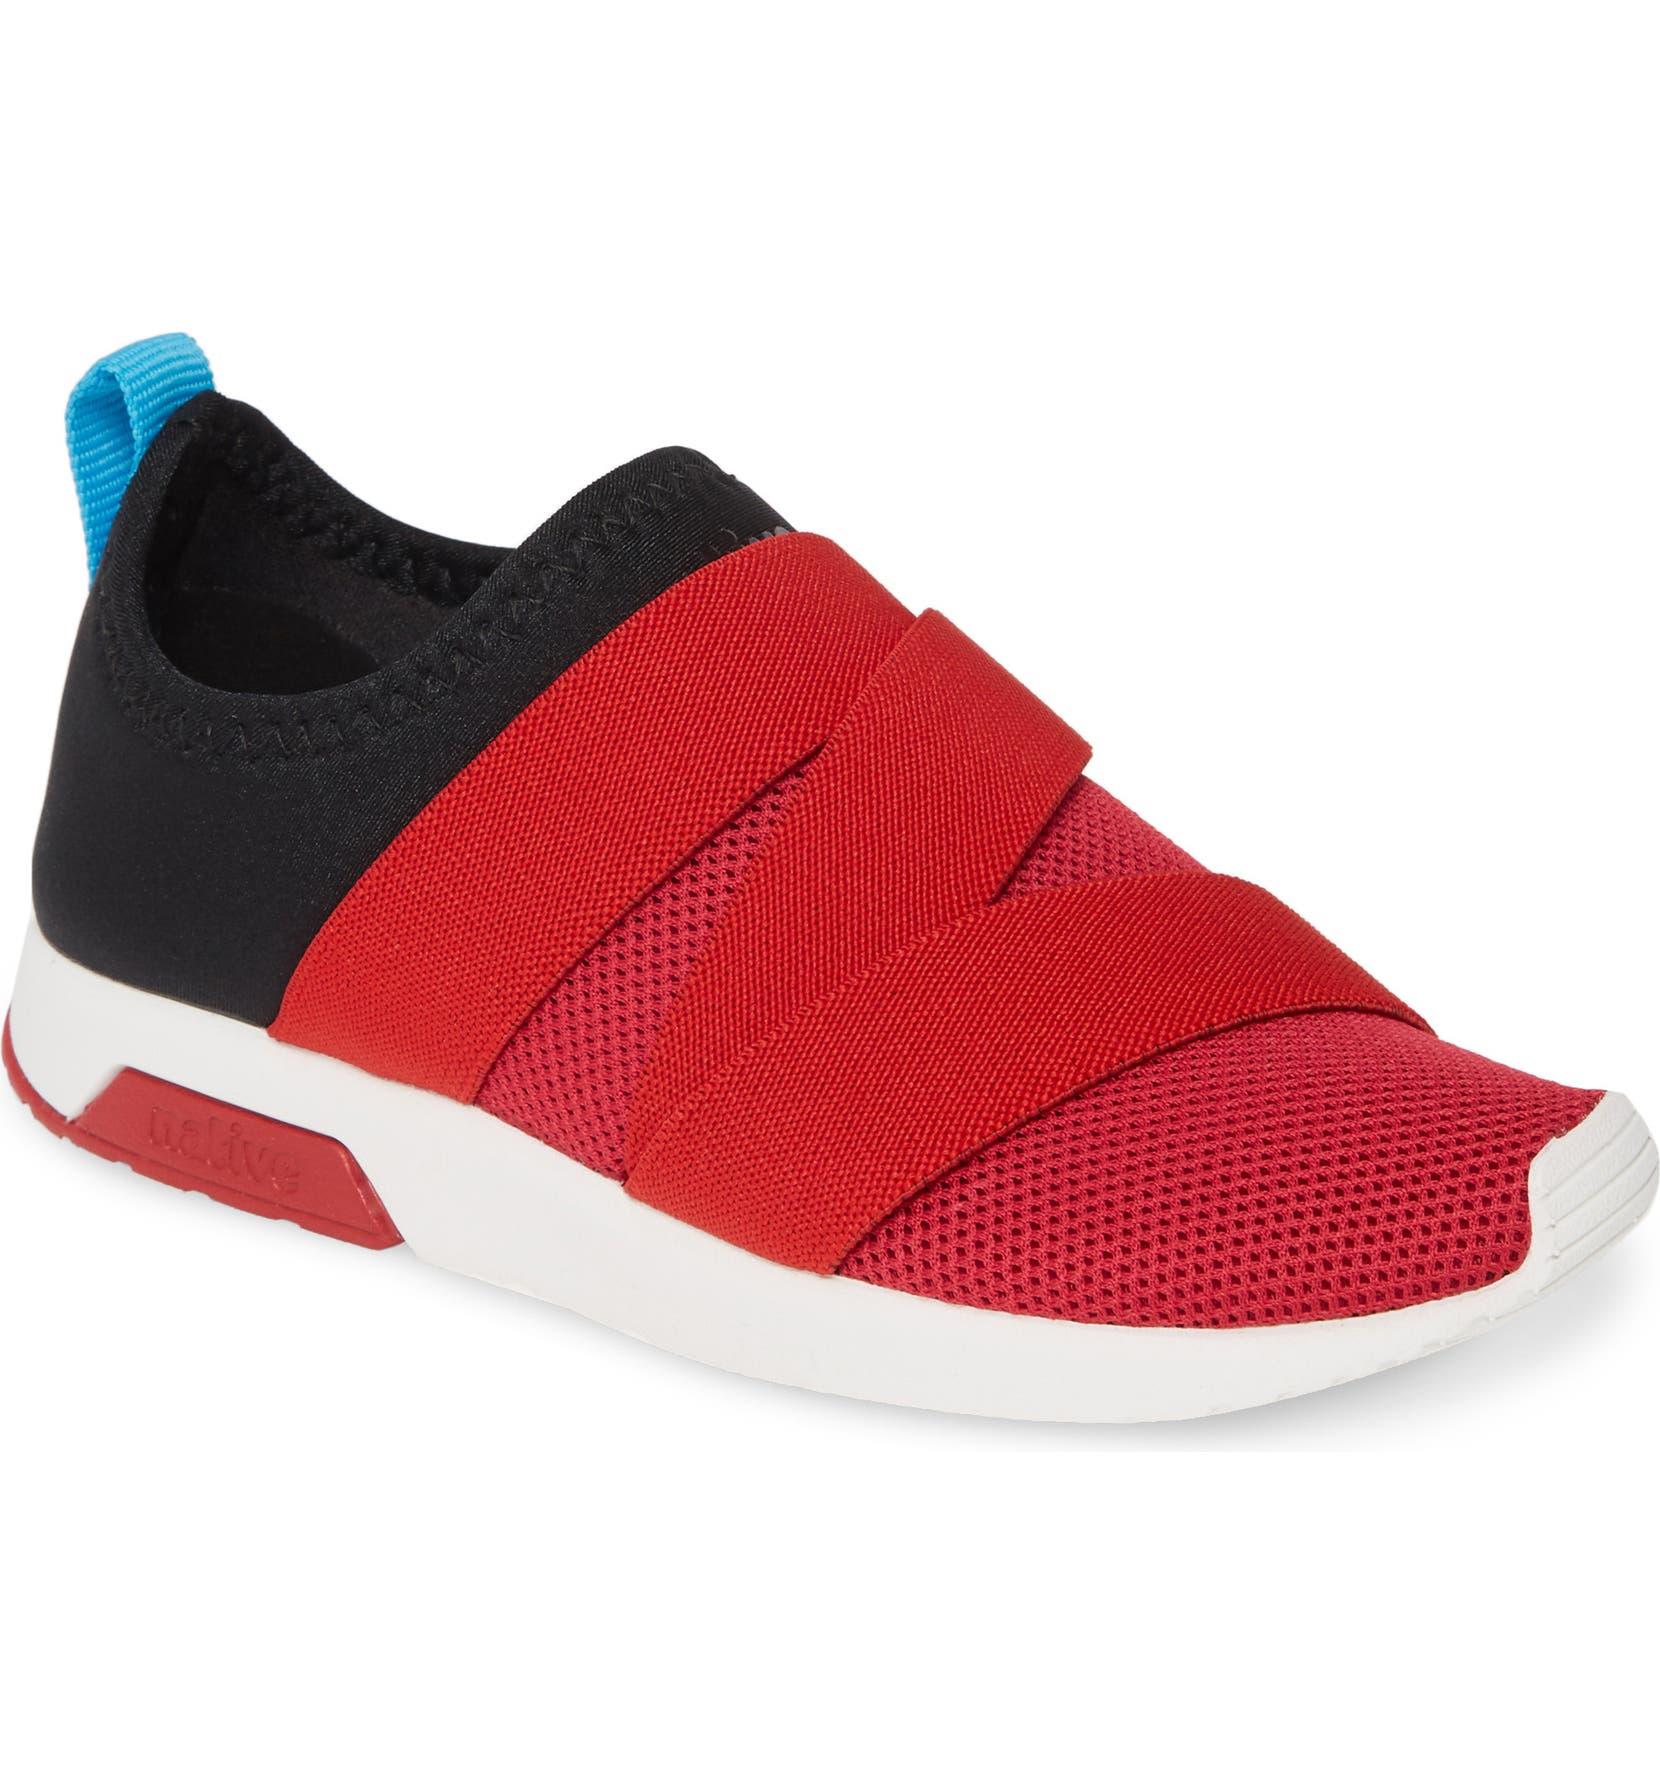 Sneaker Phoenix Phoenix Sneaker Vegan Slip Vegan On Slip On Slip Phoenix rxhdCsQtoB